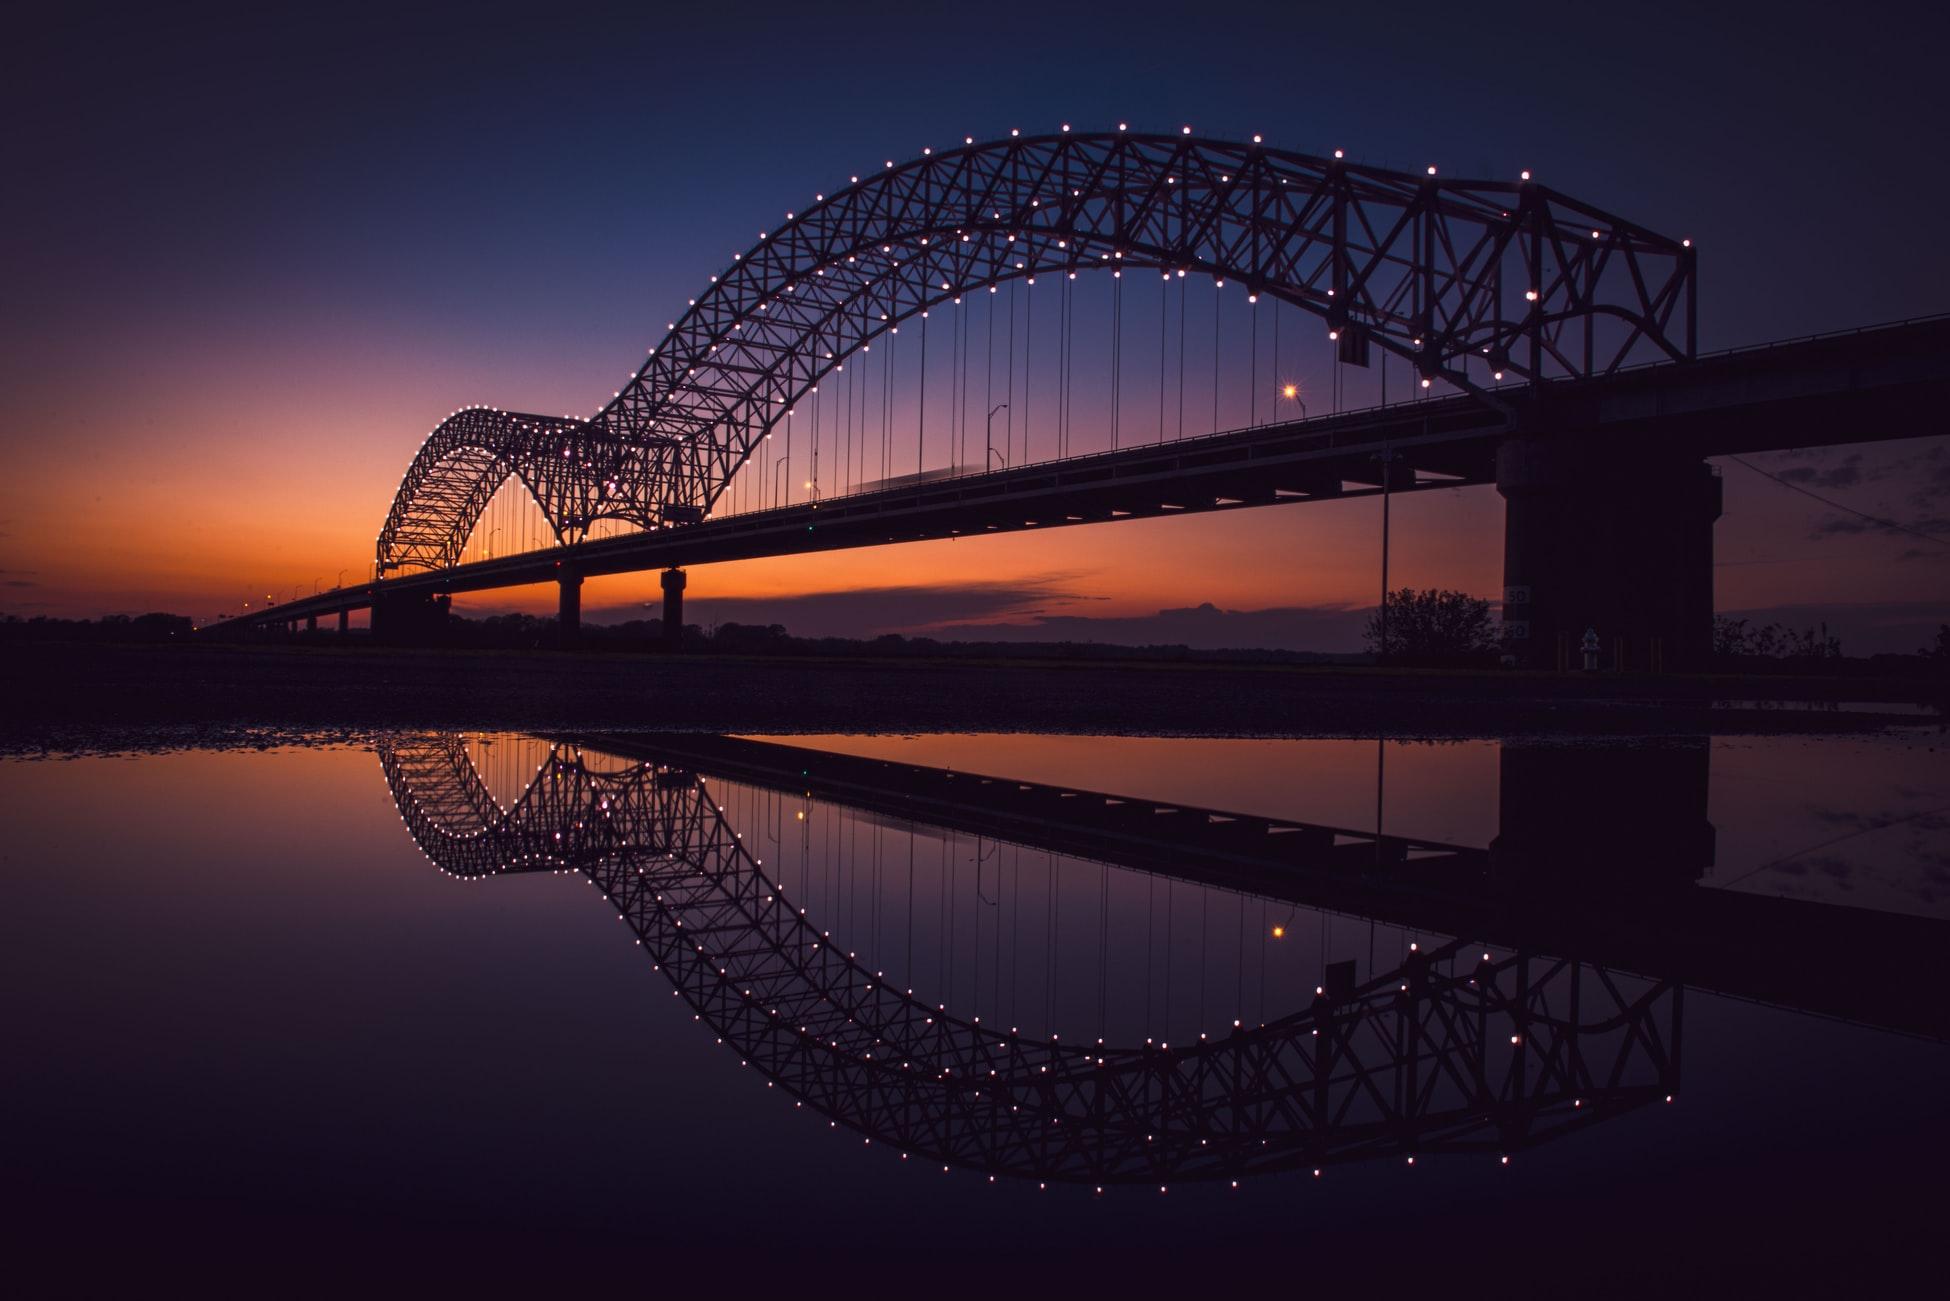 The Memphis Bridge at sunset